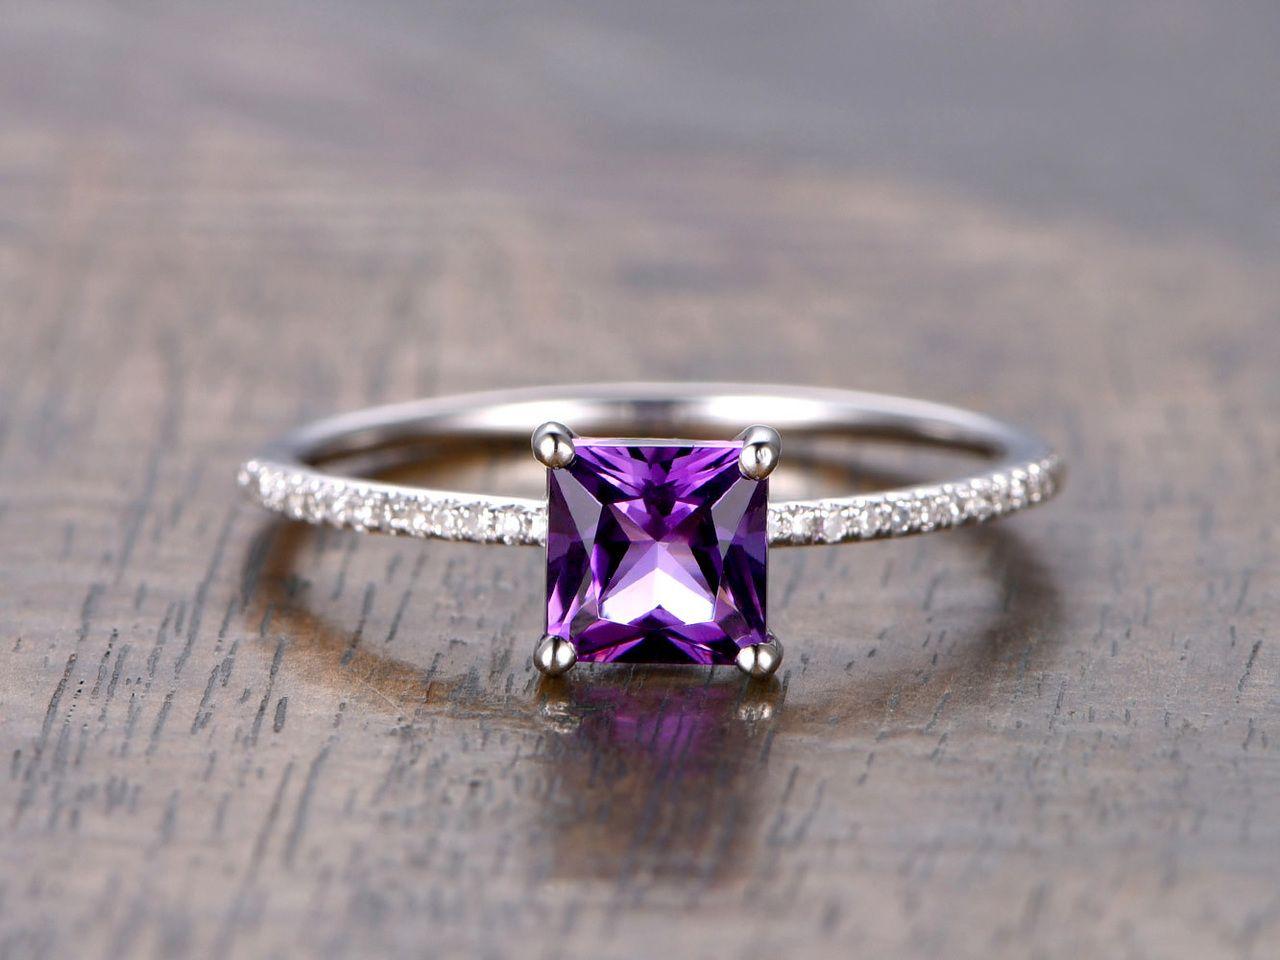 Amethyst engagement ring diamond 14k white gold princess